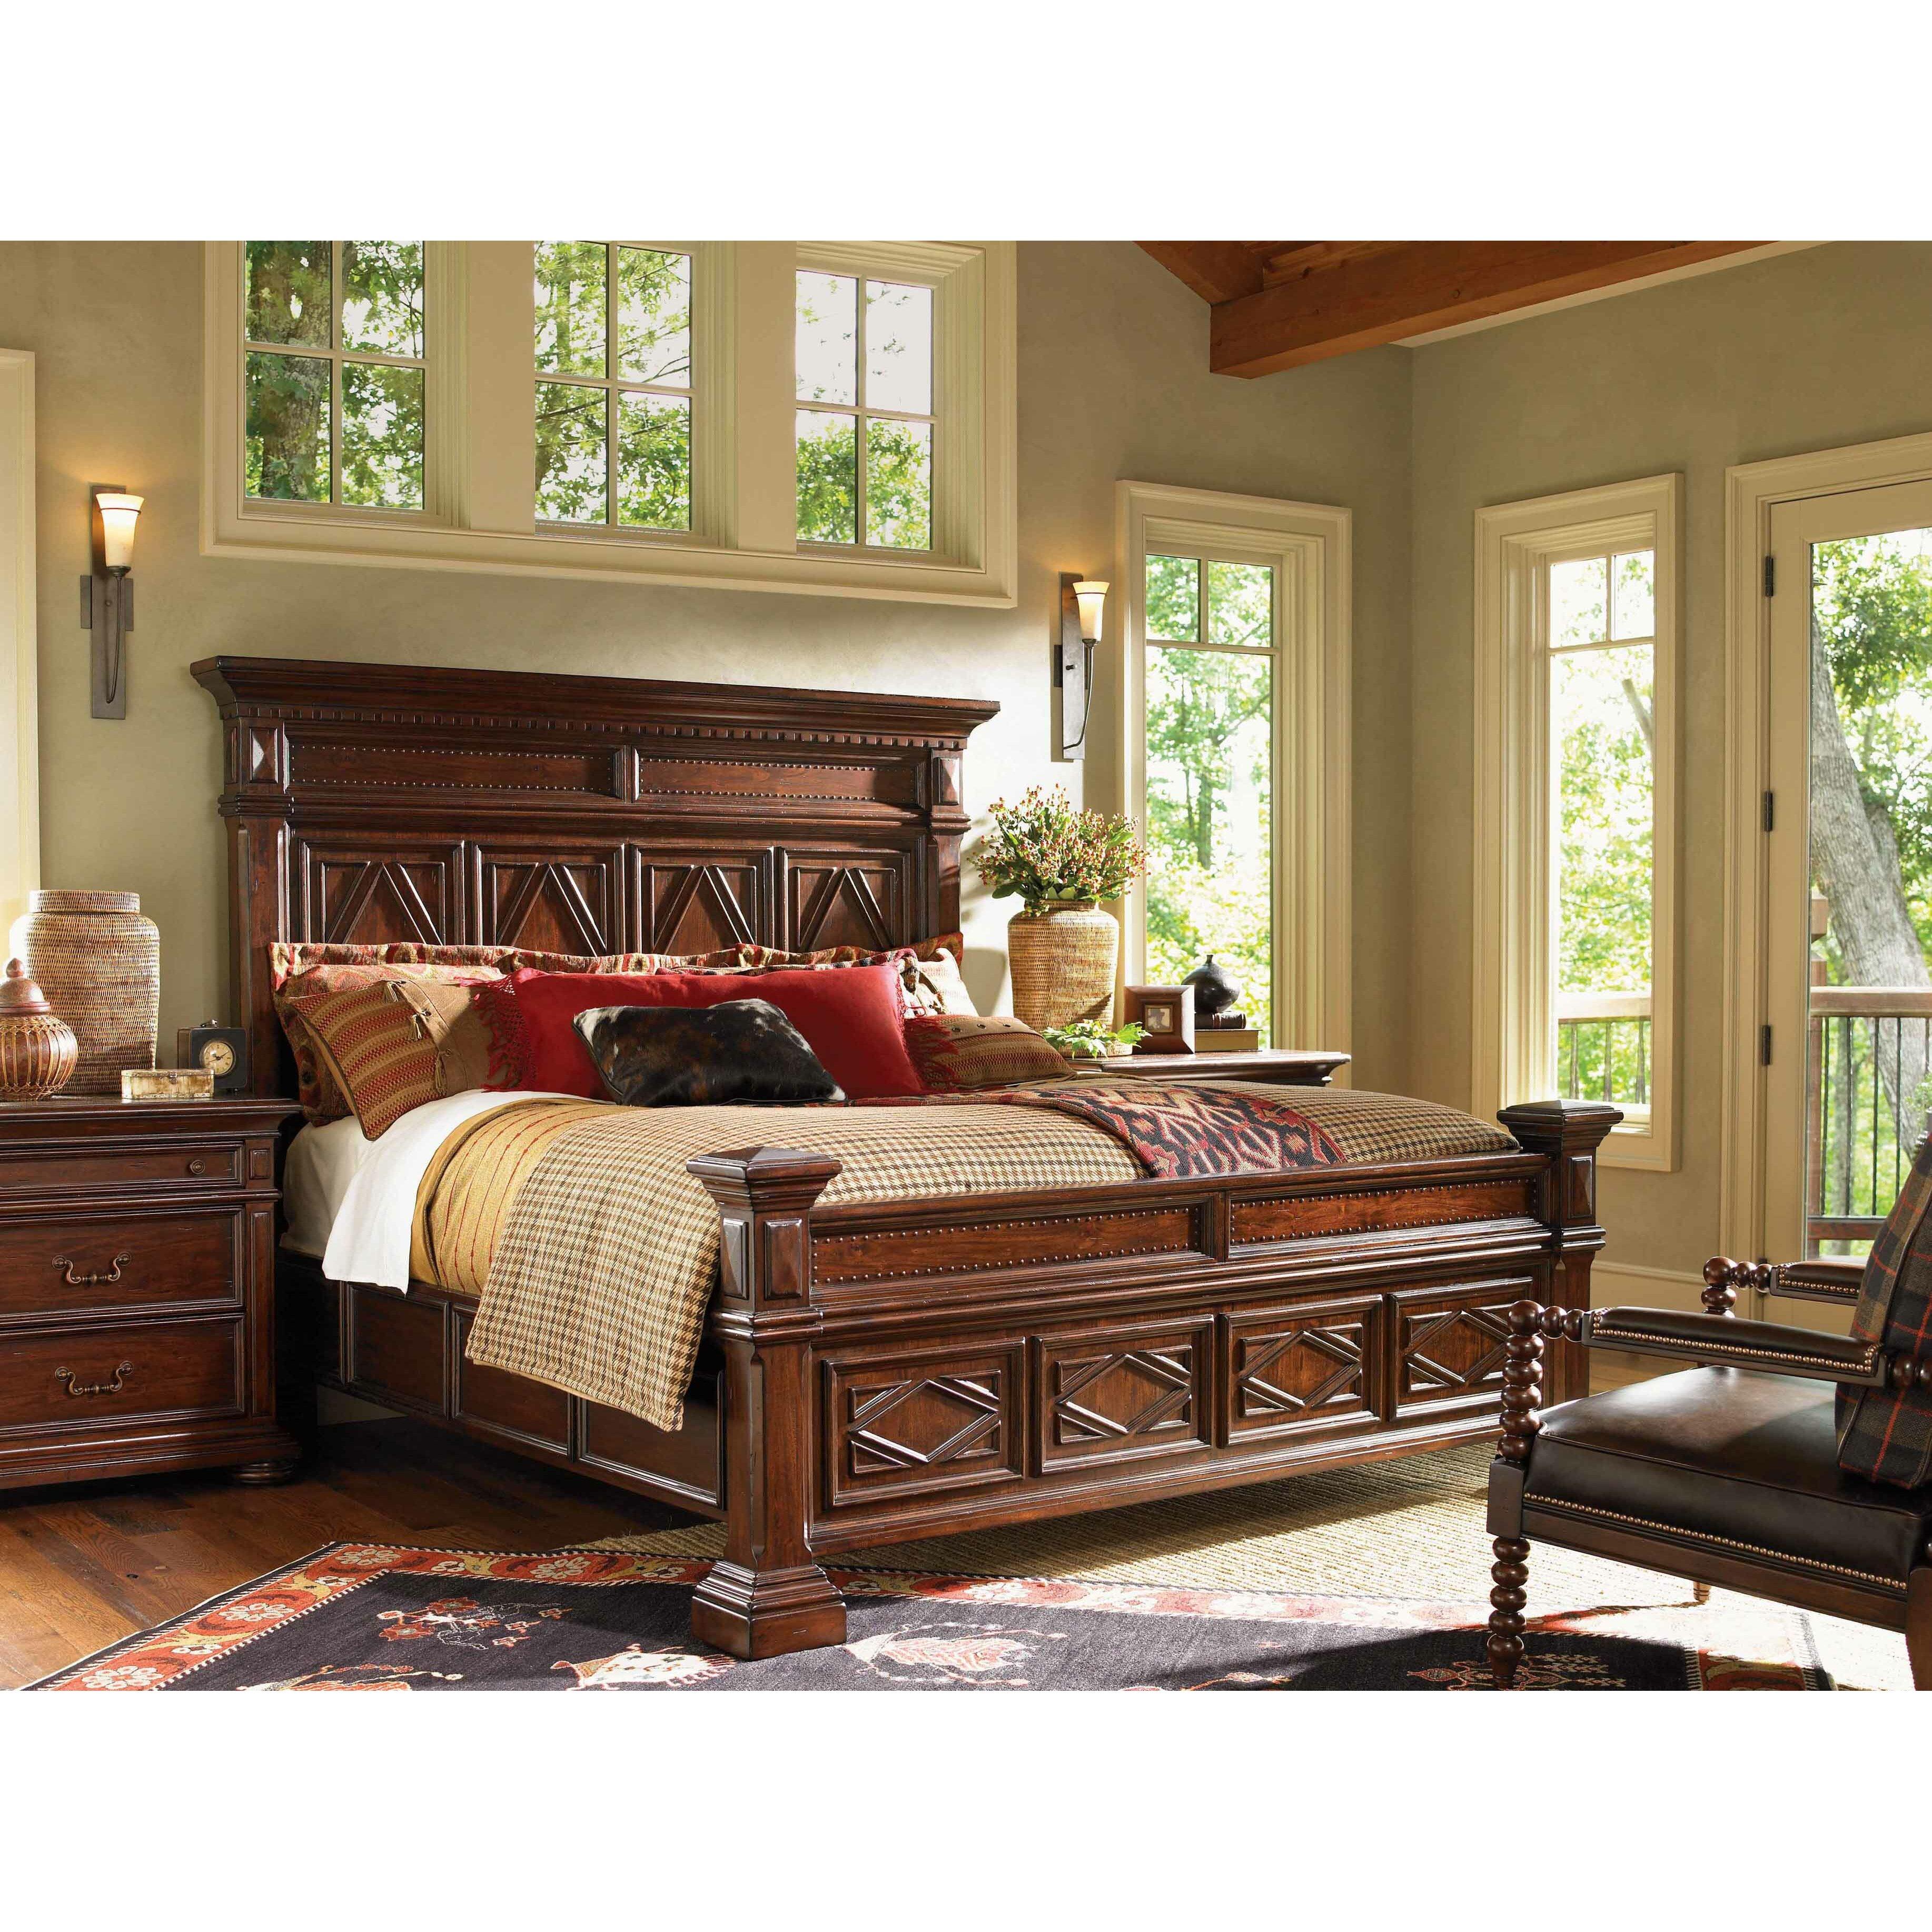 Lodge Bedroom Furniture Lexington Fieldale Lodge Panel Customizable Bedroom Set Reviews